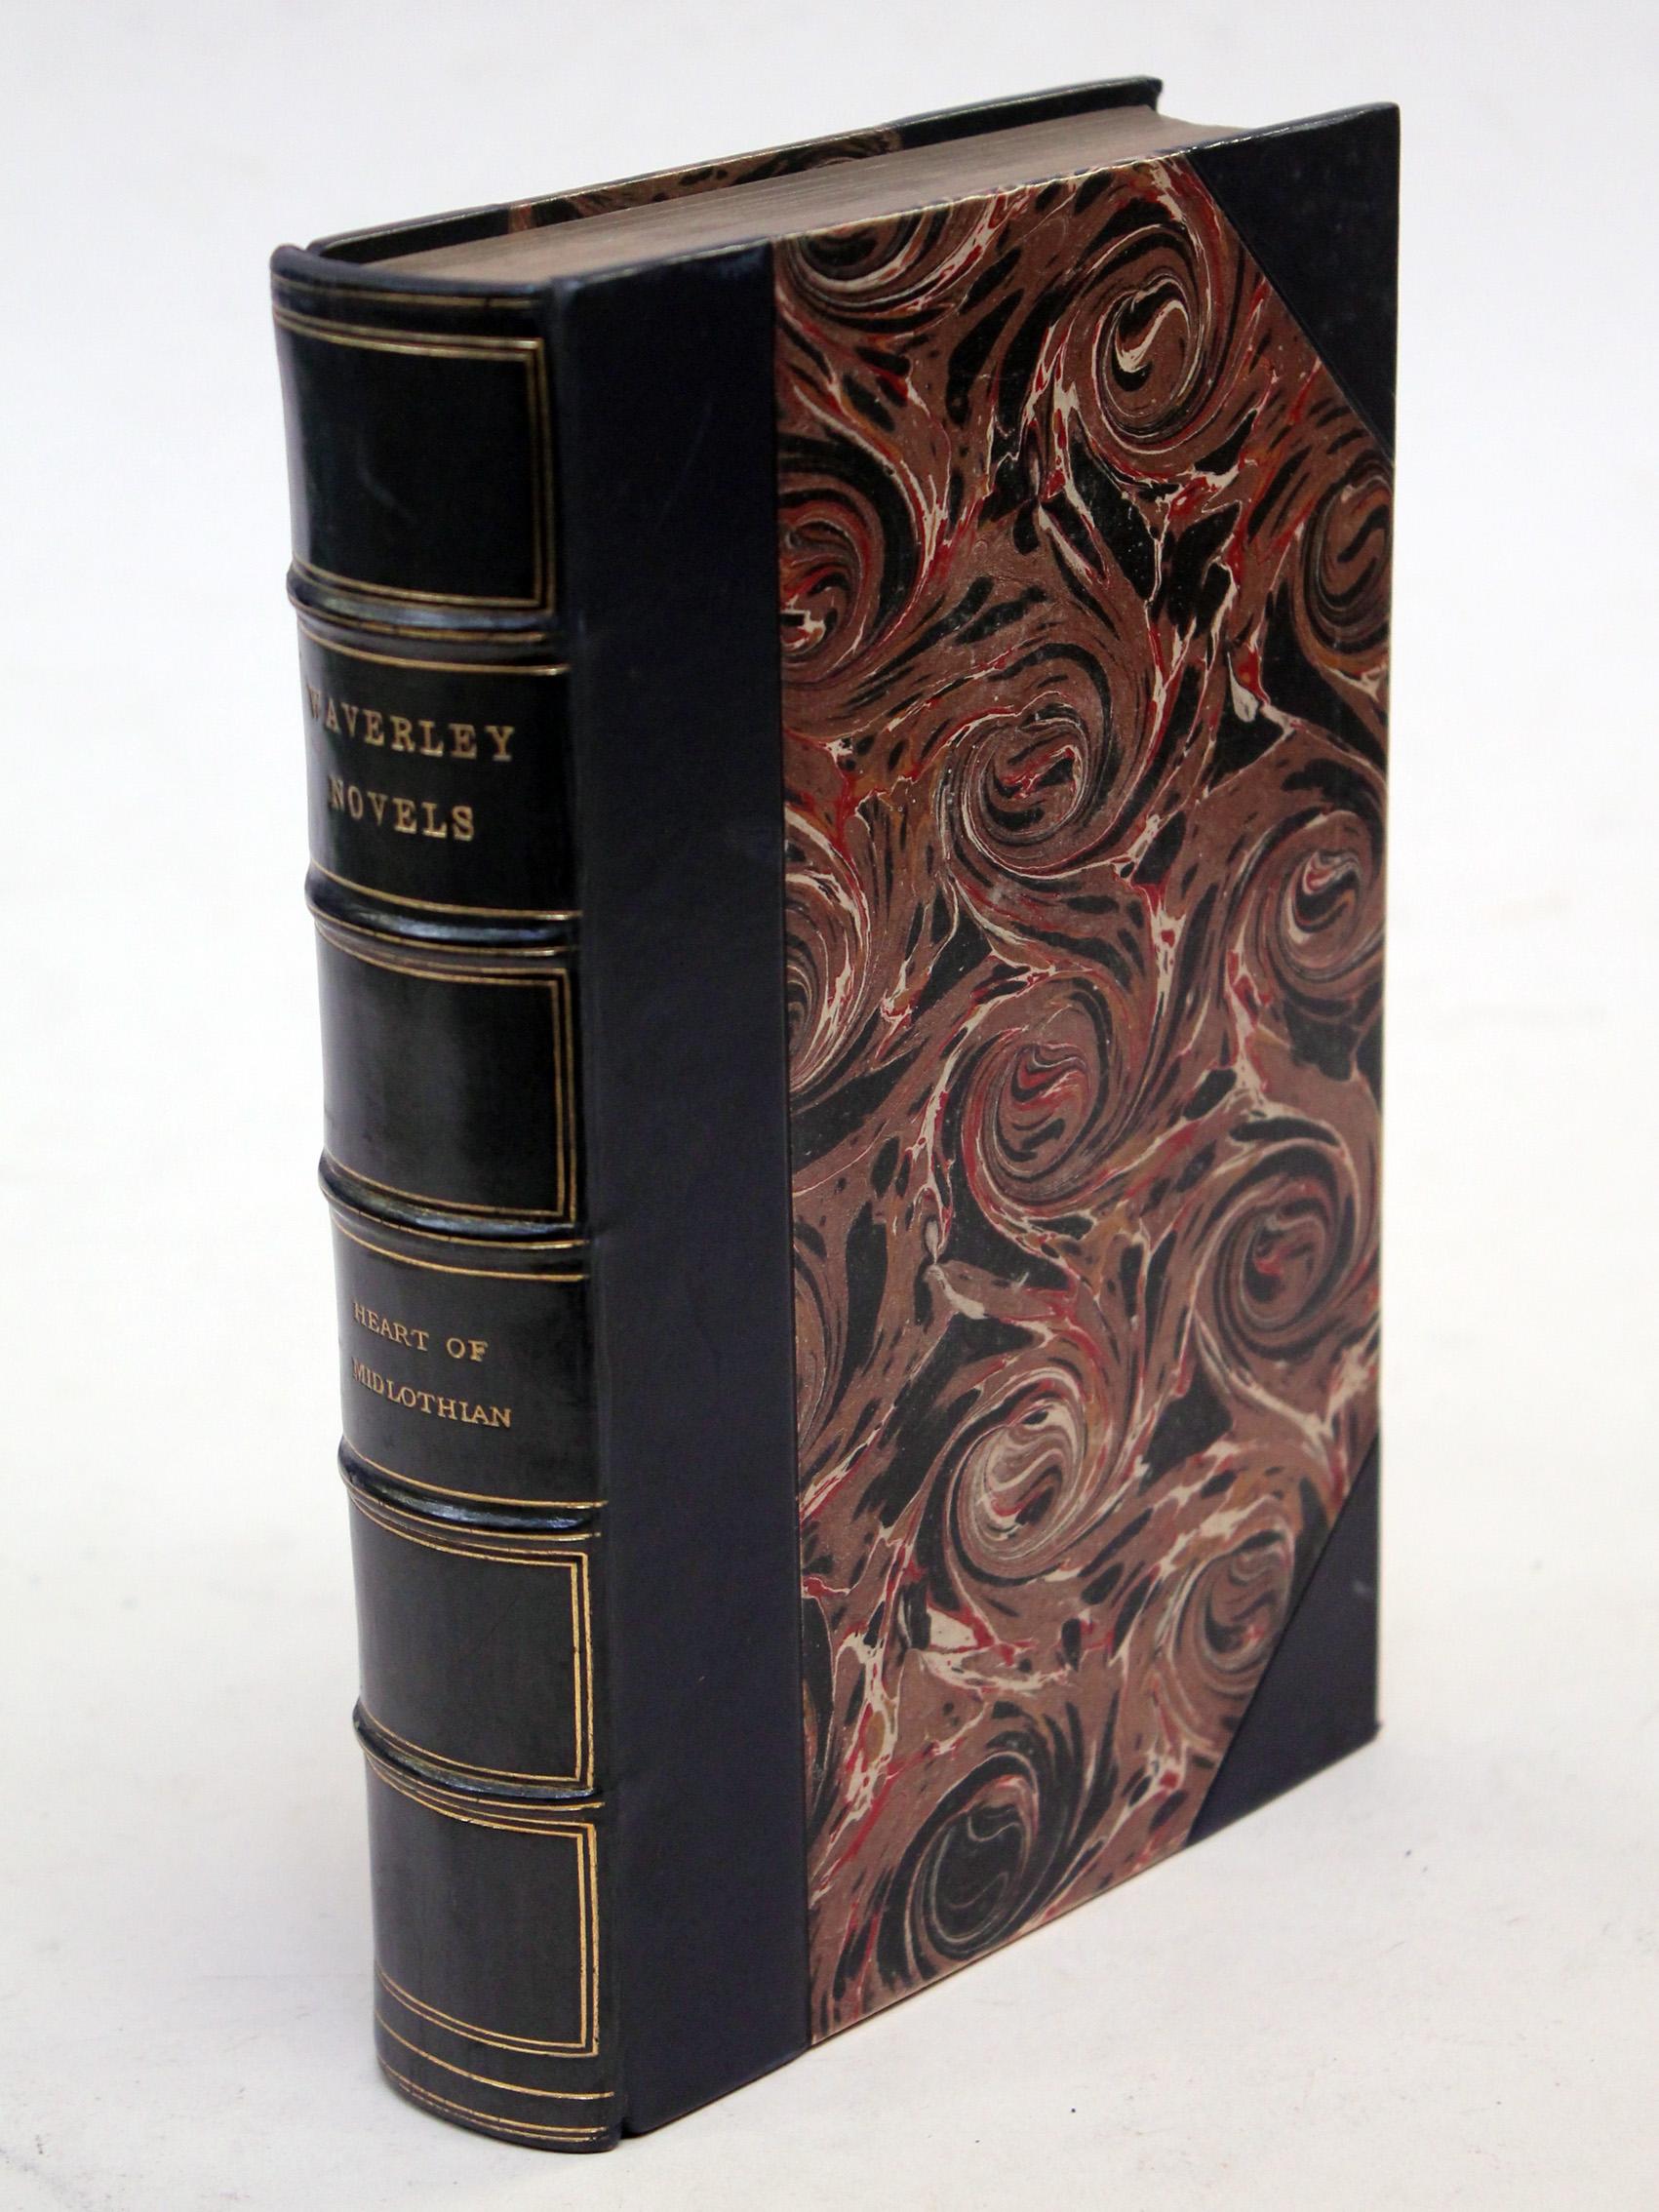 1871 25 Vols Sir Walter Scott Waverley Novels Centenary Edition Leather Binding